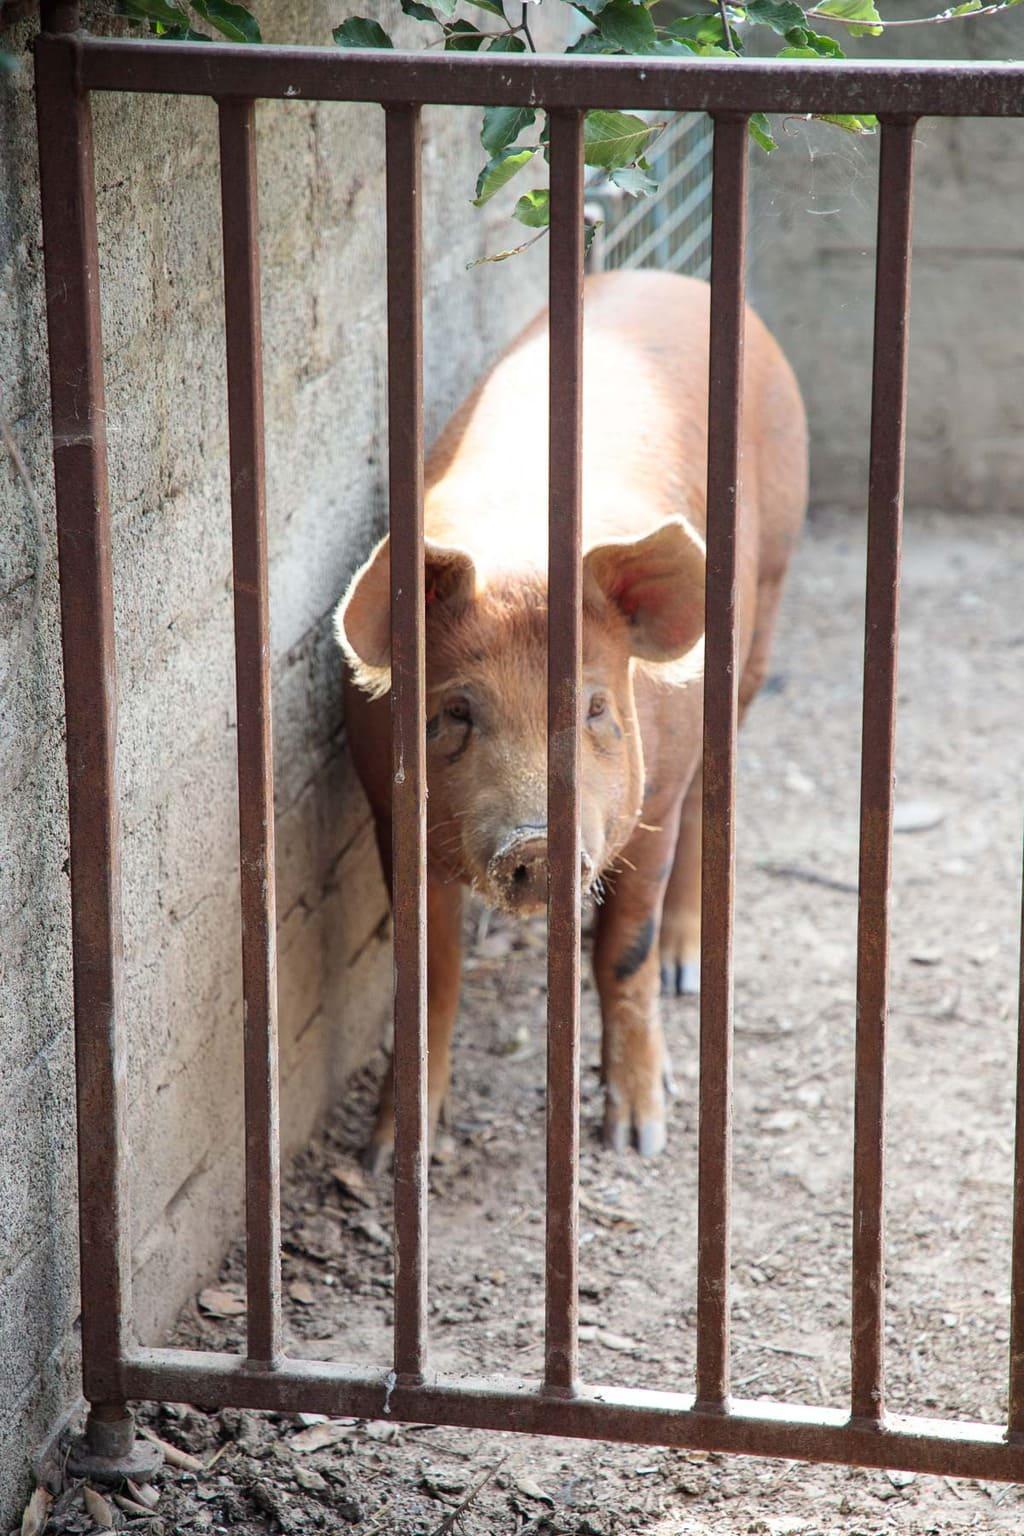 Photo of a happy organic pig from Ballymaloe Farms.